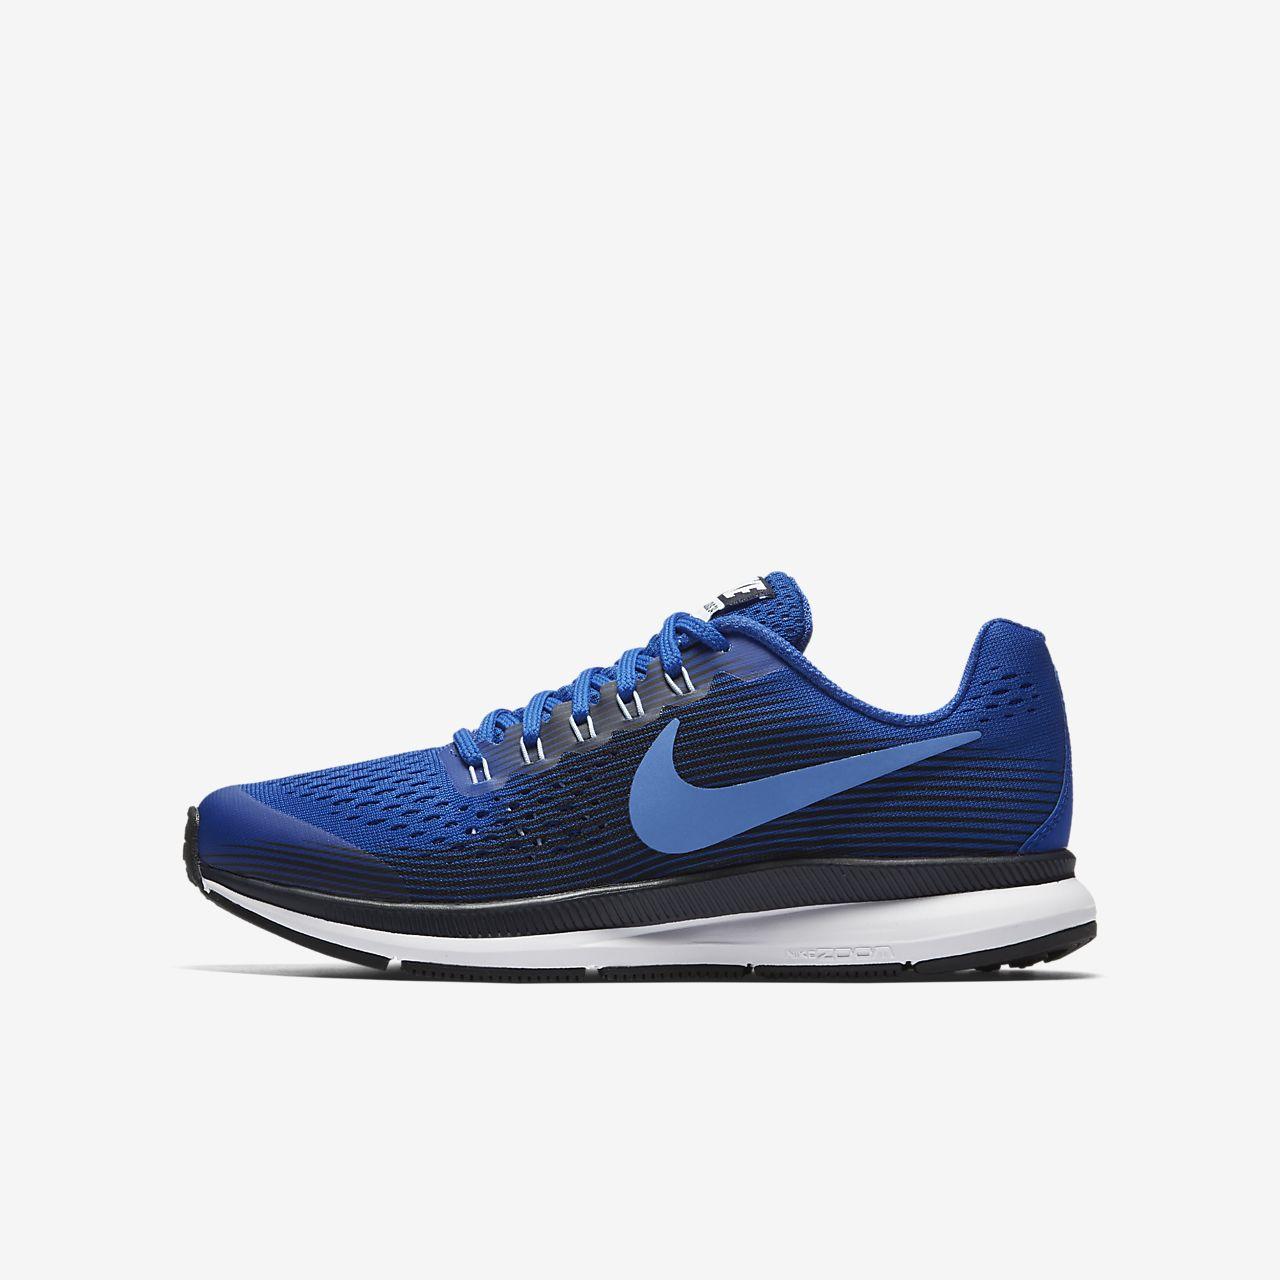 c979e588399a Nike Zoom Pegasus 34 Kids  Running Shoe. Nike.com GB